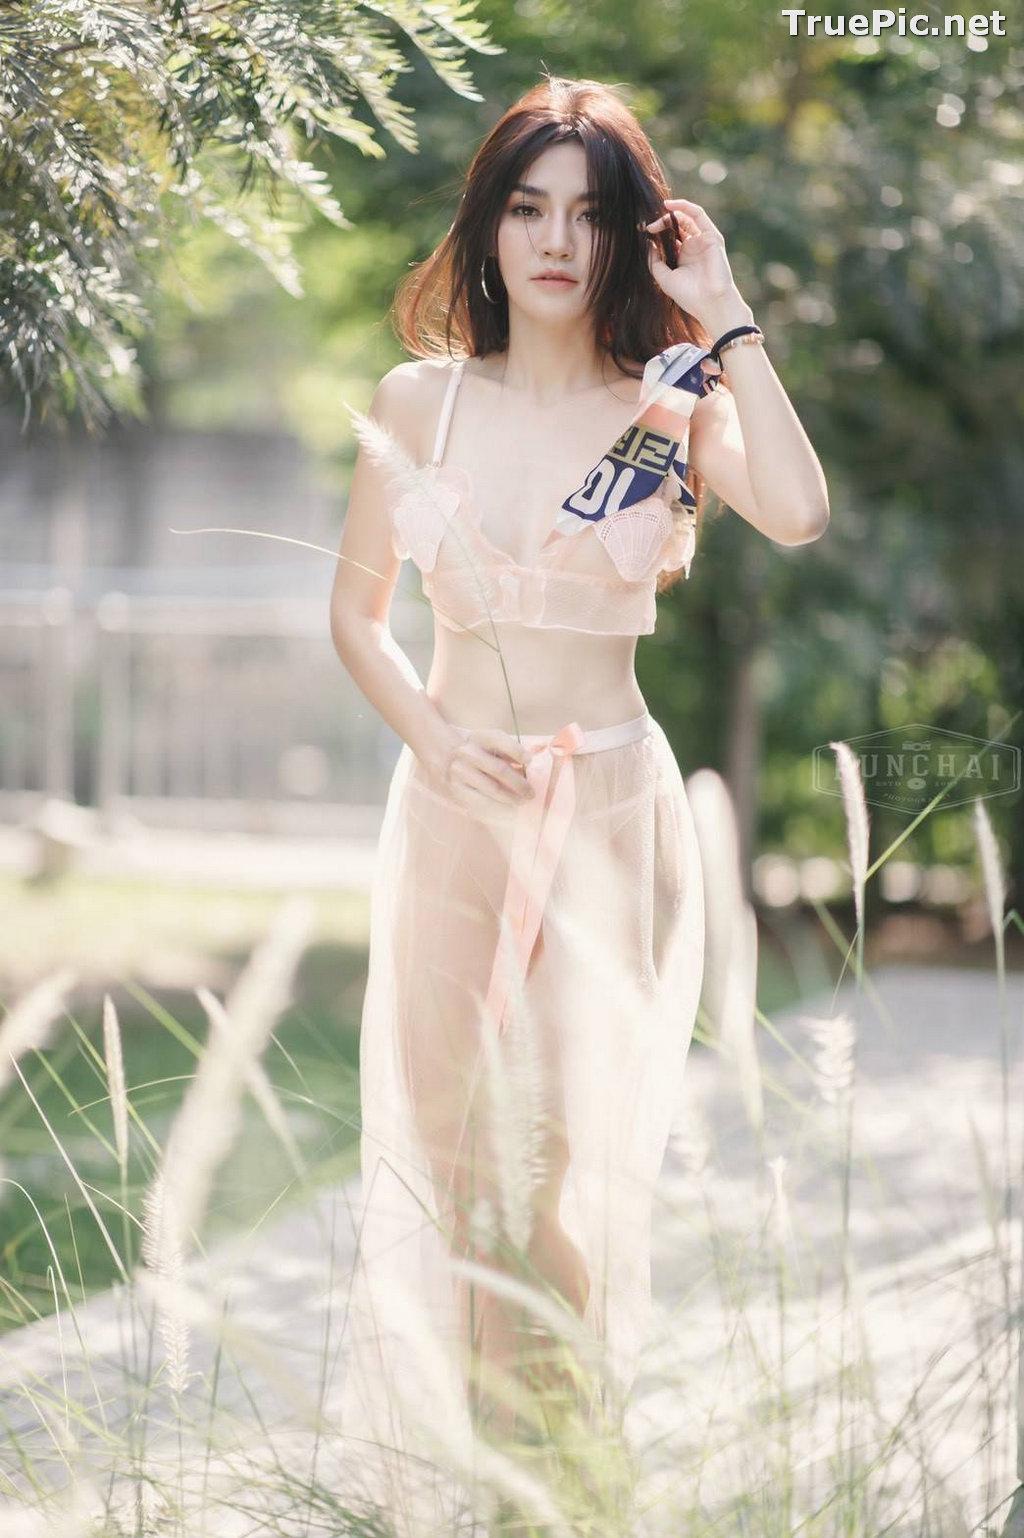 Image Thailand Model - ลฎาภา รัชตะอมรโชติ - Pink Transparent Lingerie - TruePic.net - Picture-9